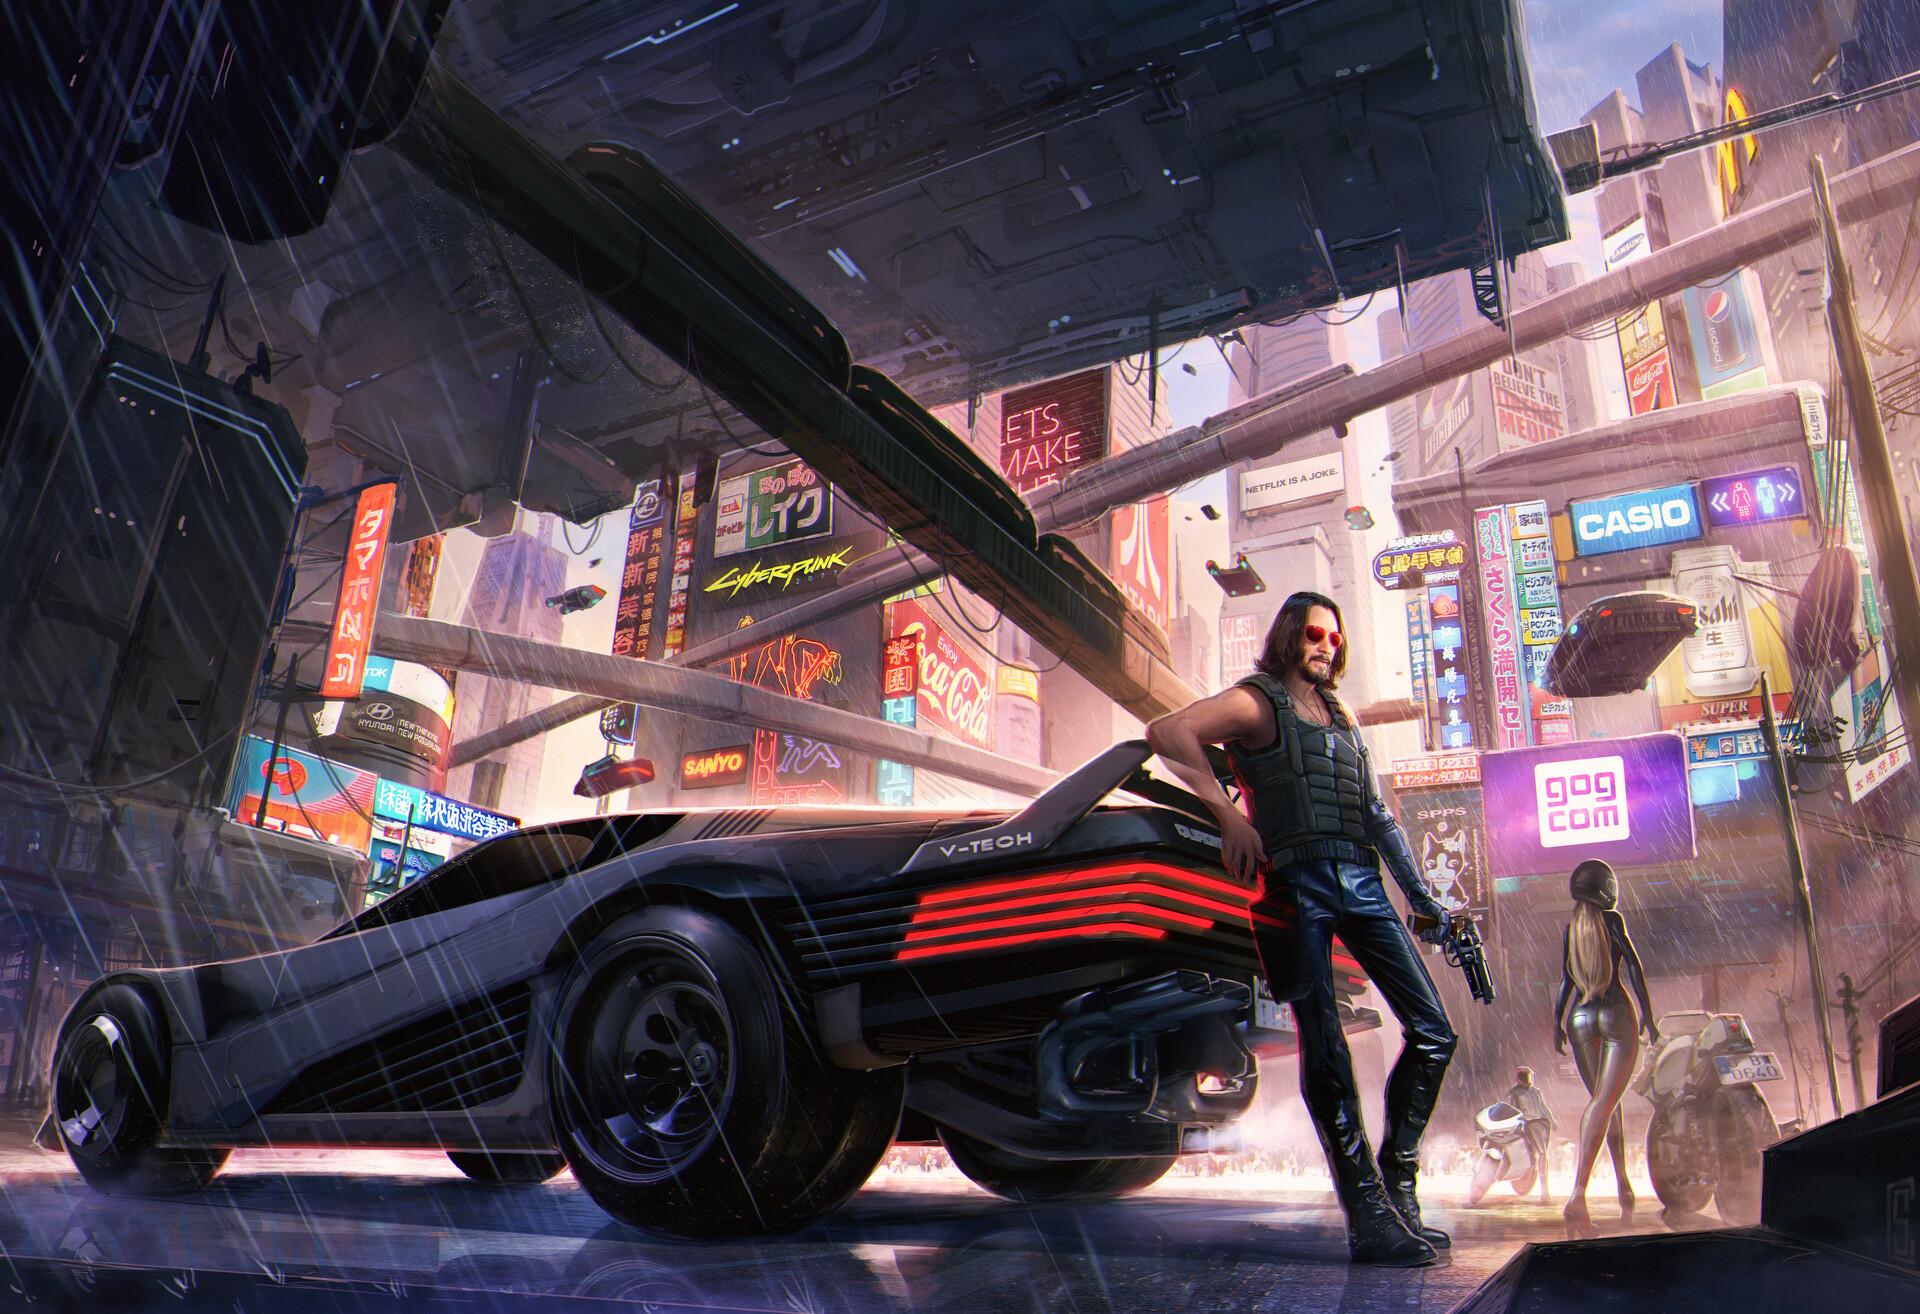 Вышел мод, который улучшит работу Cyberpunk 2077 на старых ПК